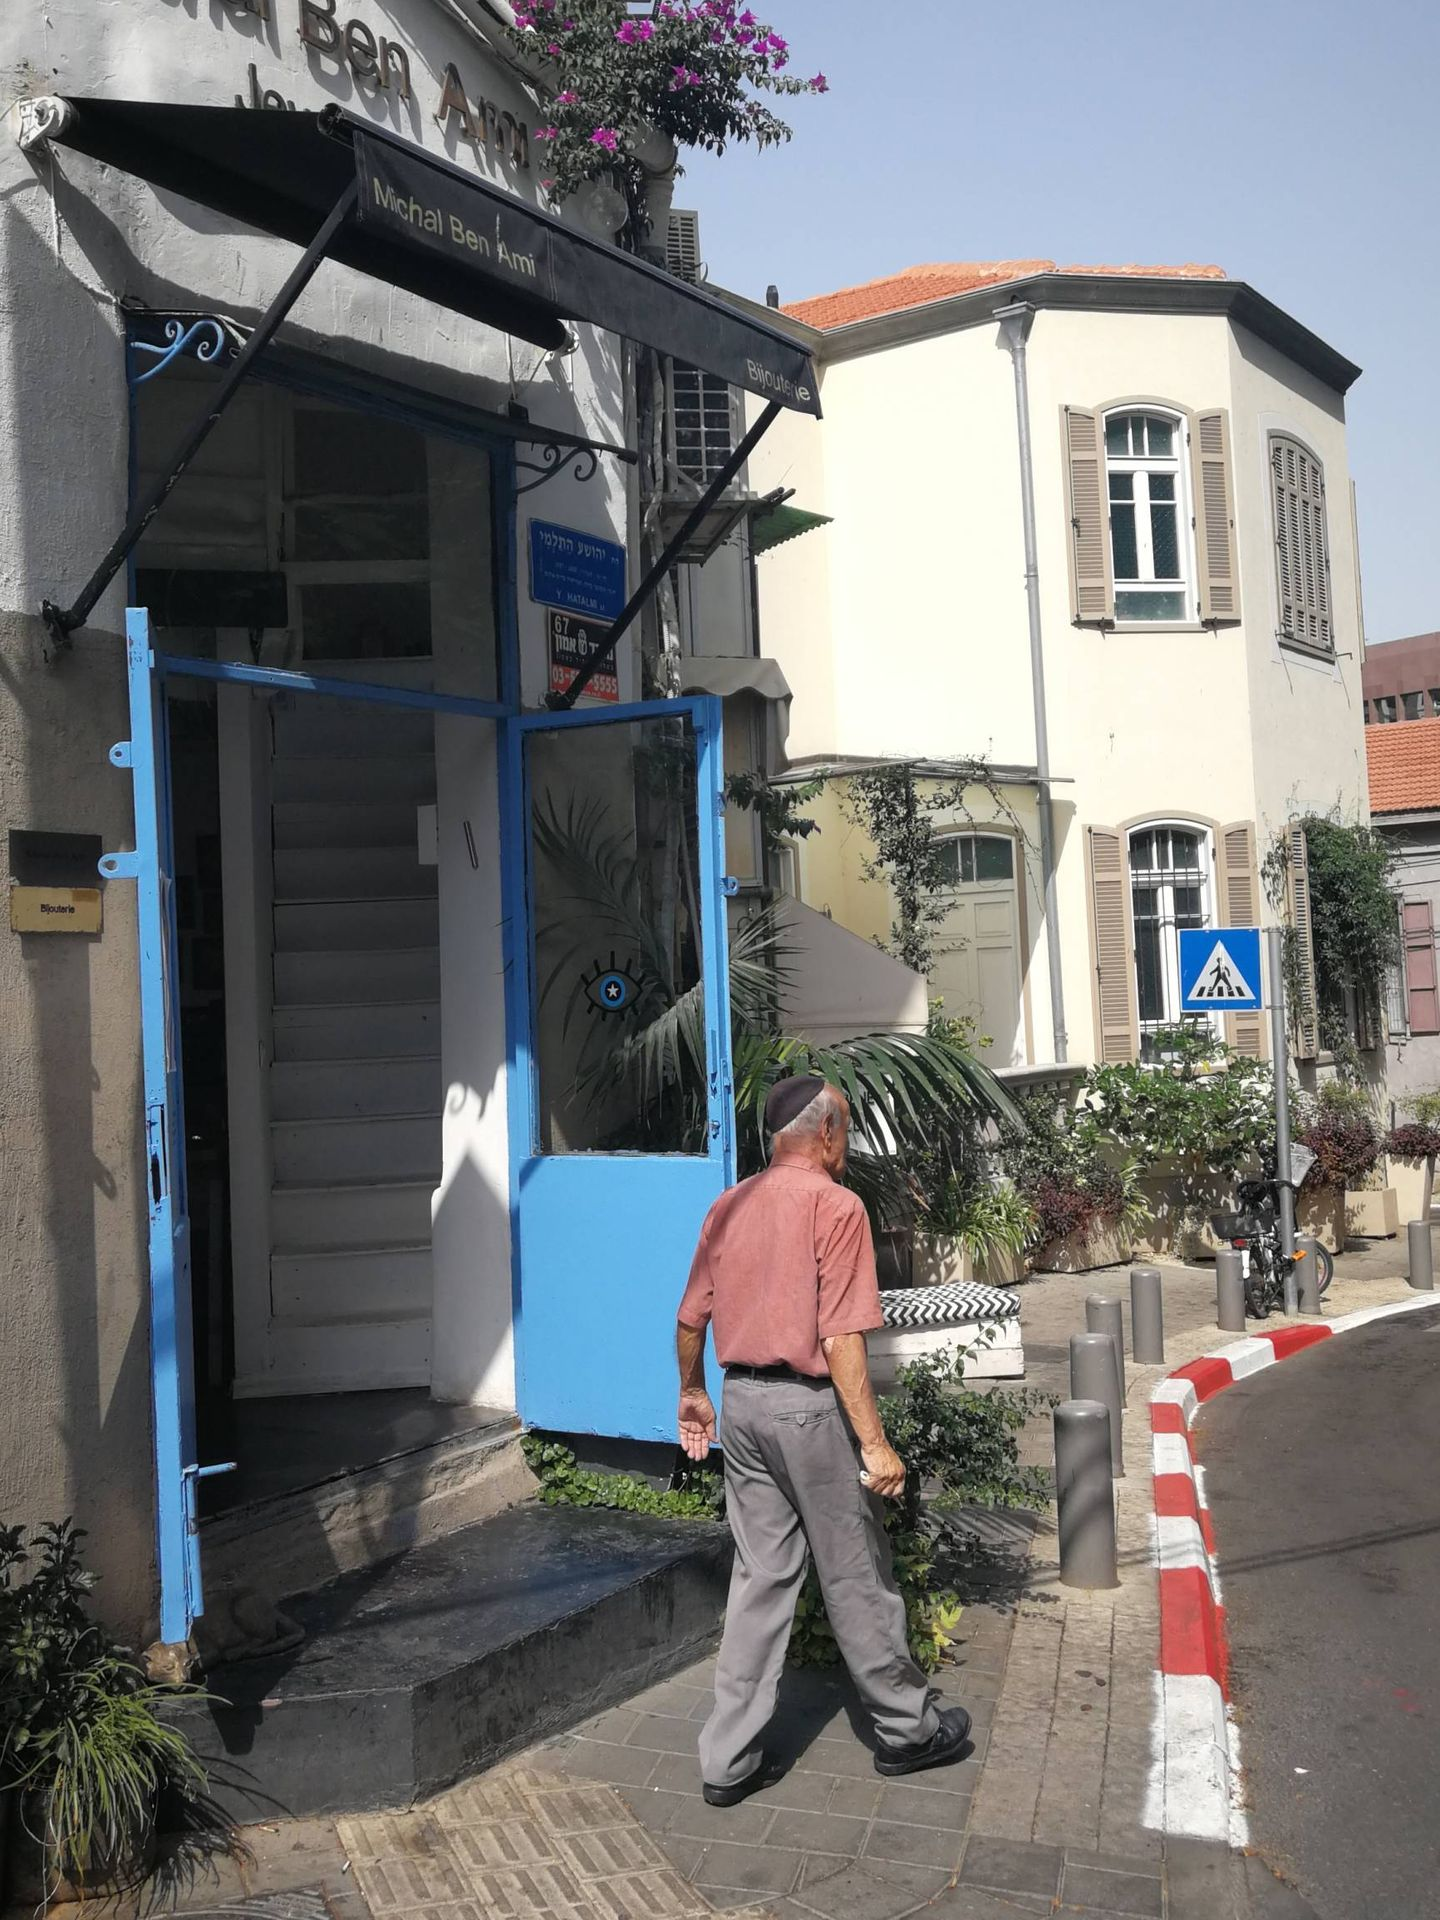 Esquina de Neve Tzedek, barrio de moda en Tel Aviv, donde vive Roman Abramovich. (S.T.)